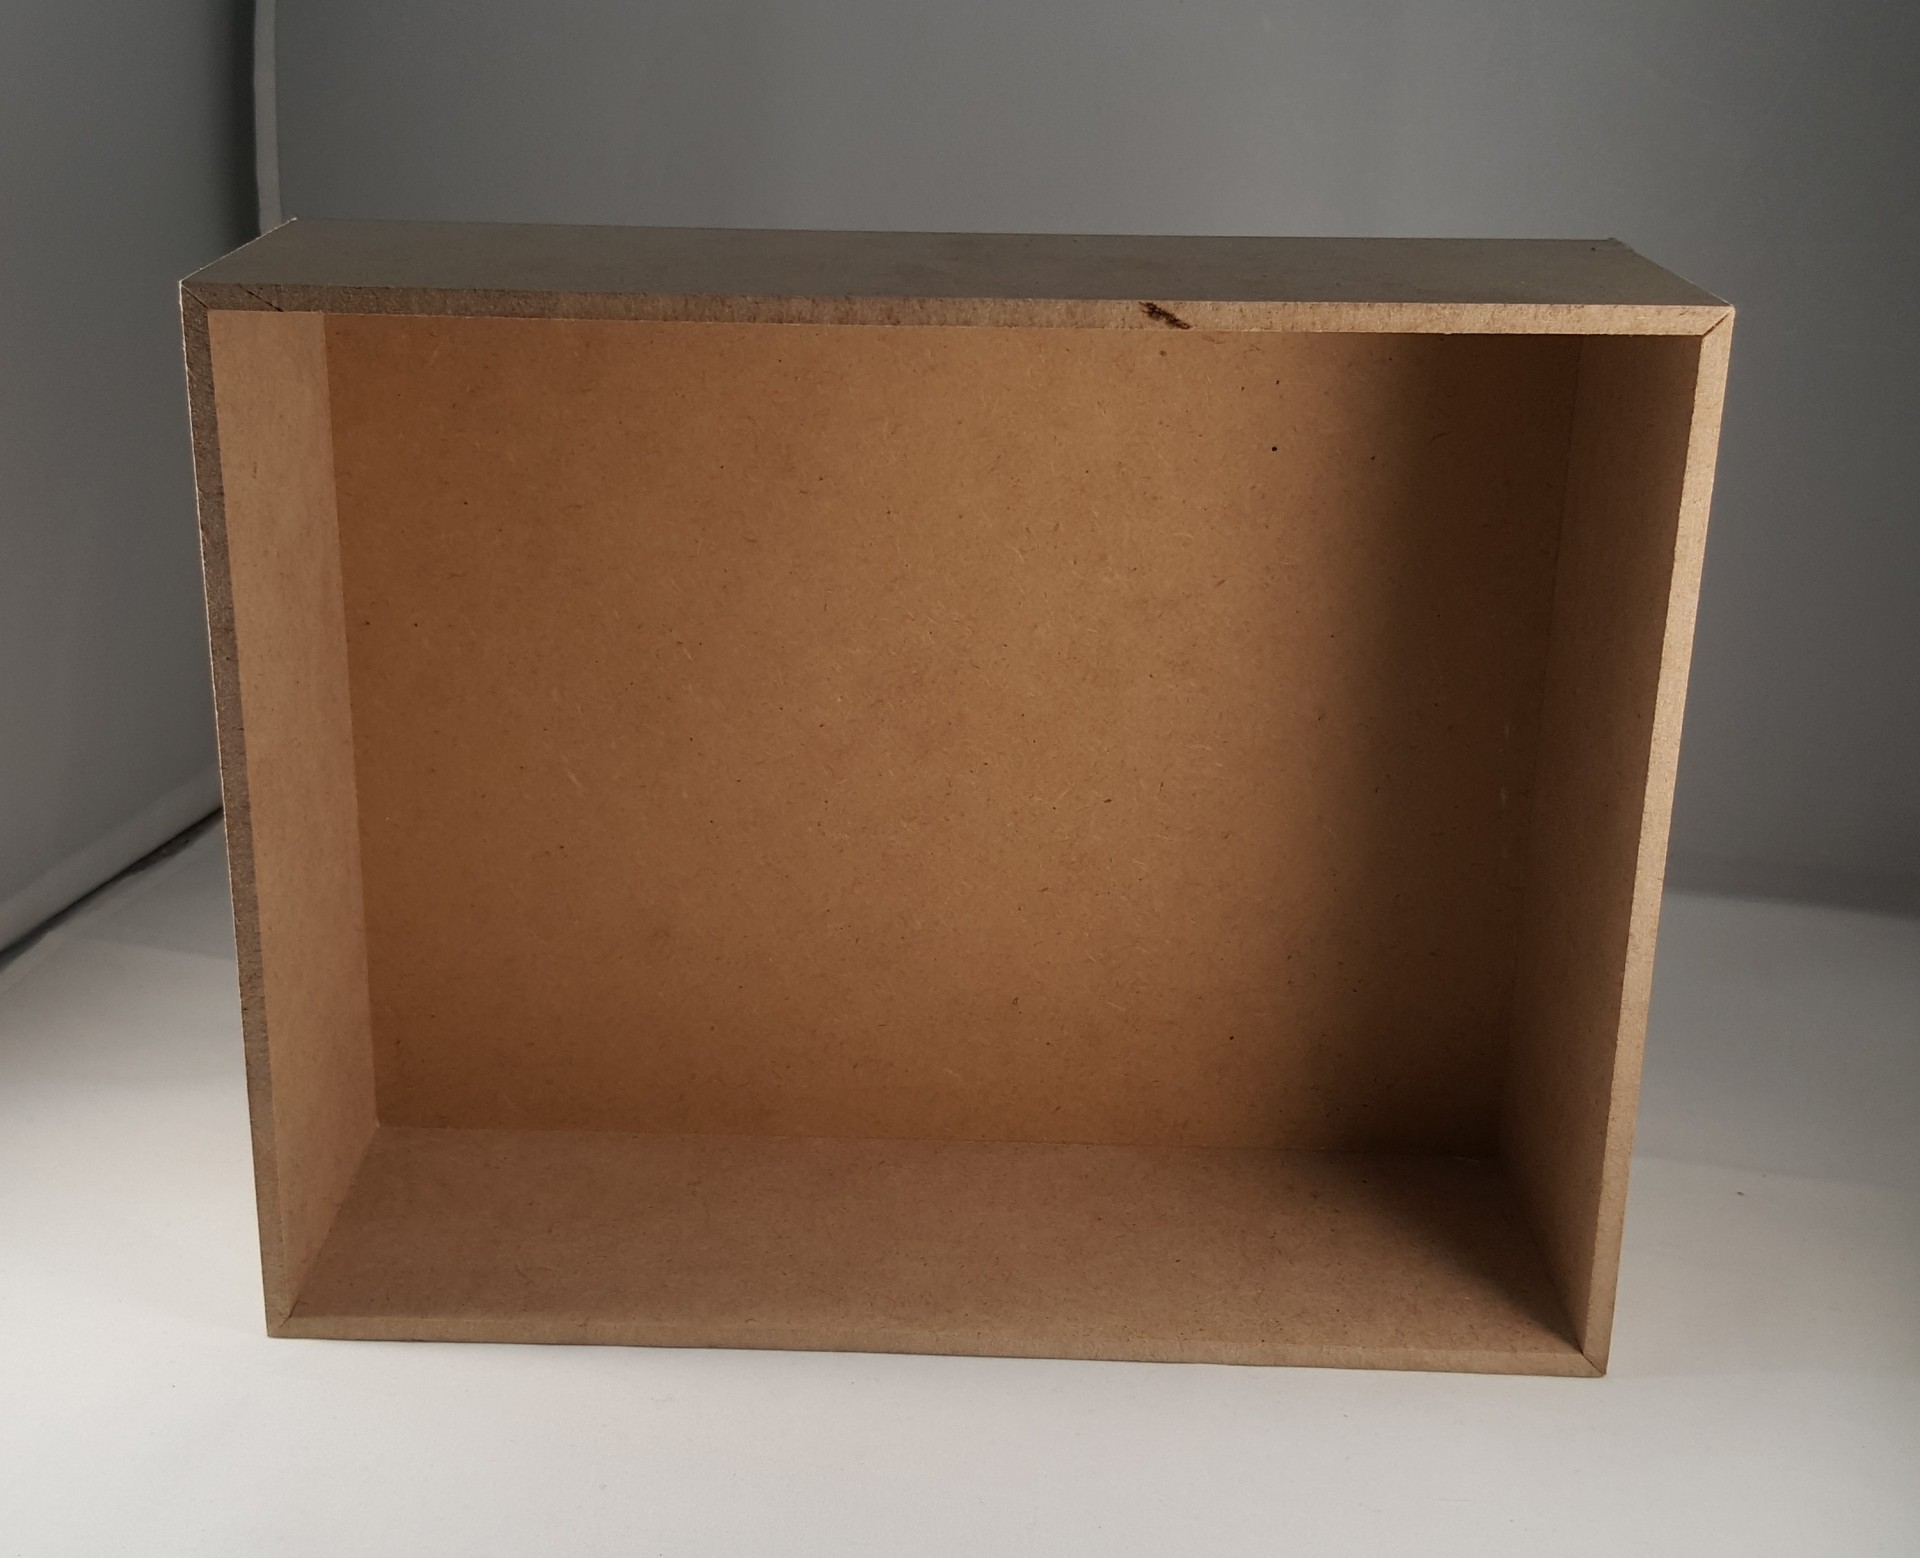 Moldura Caixa sem vidro